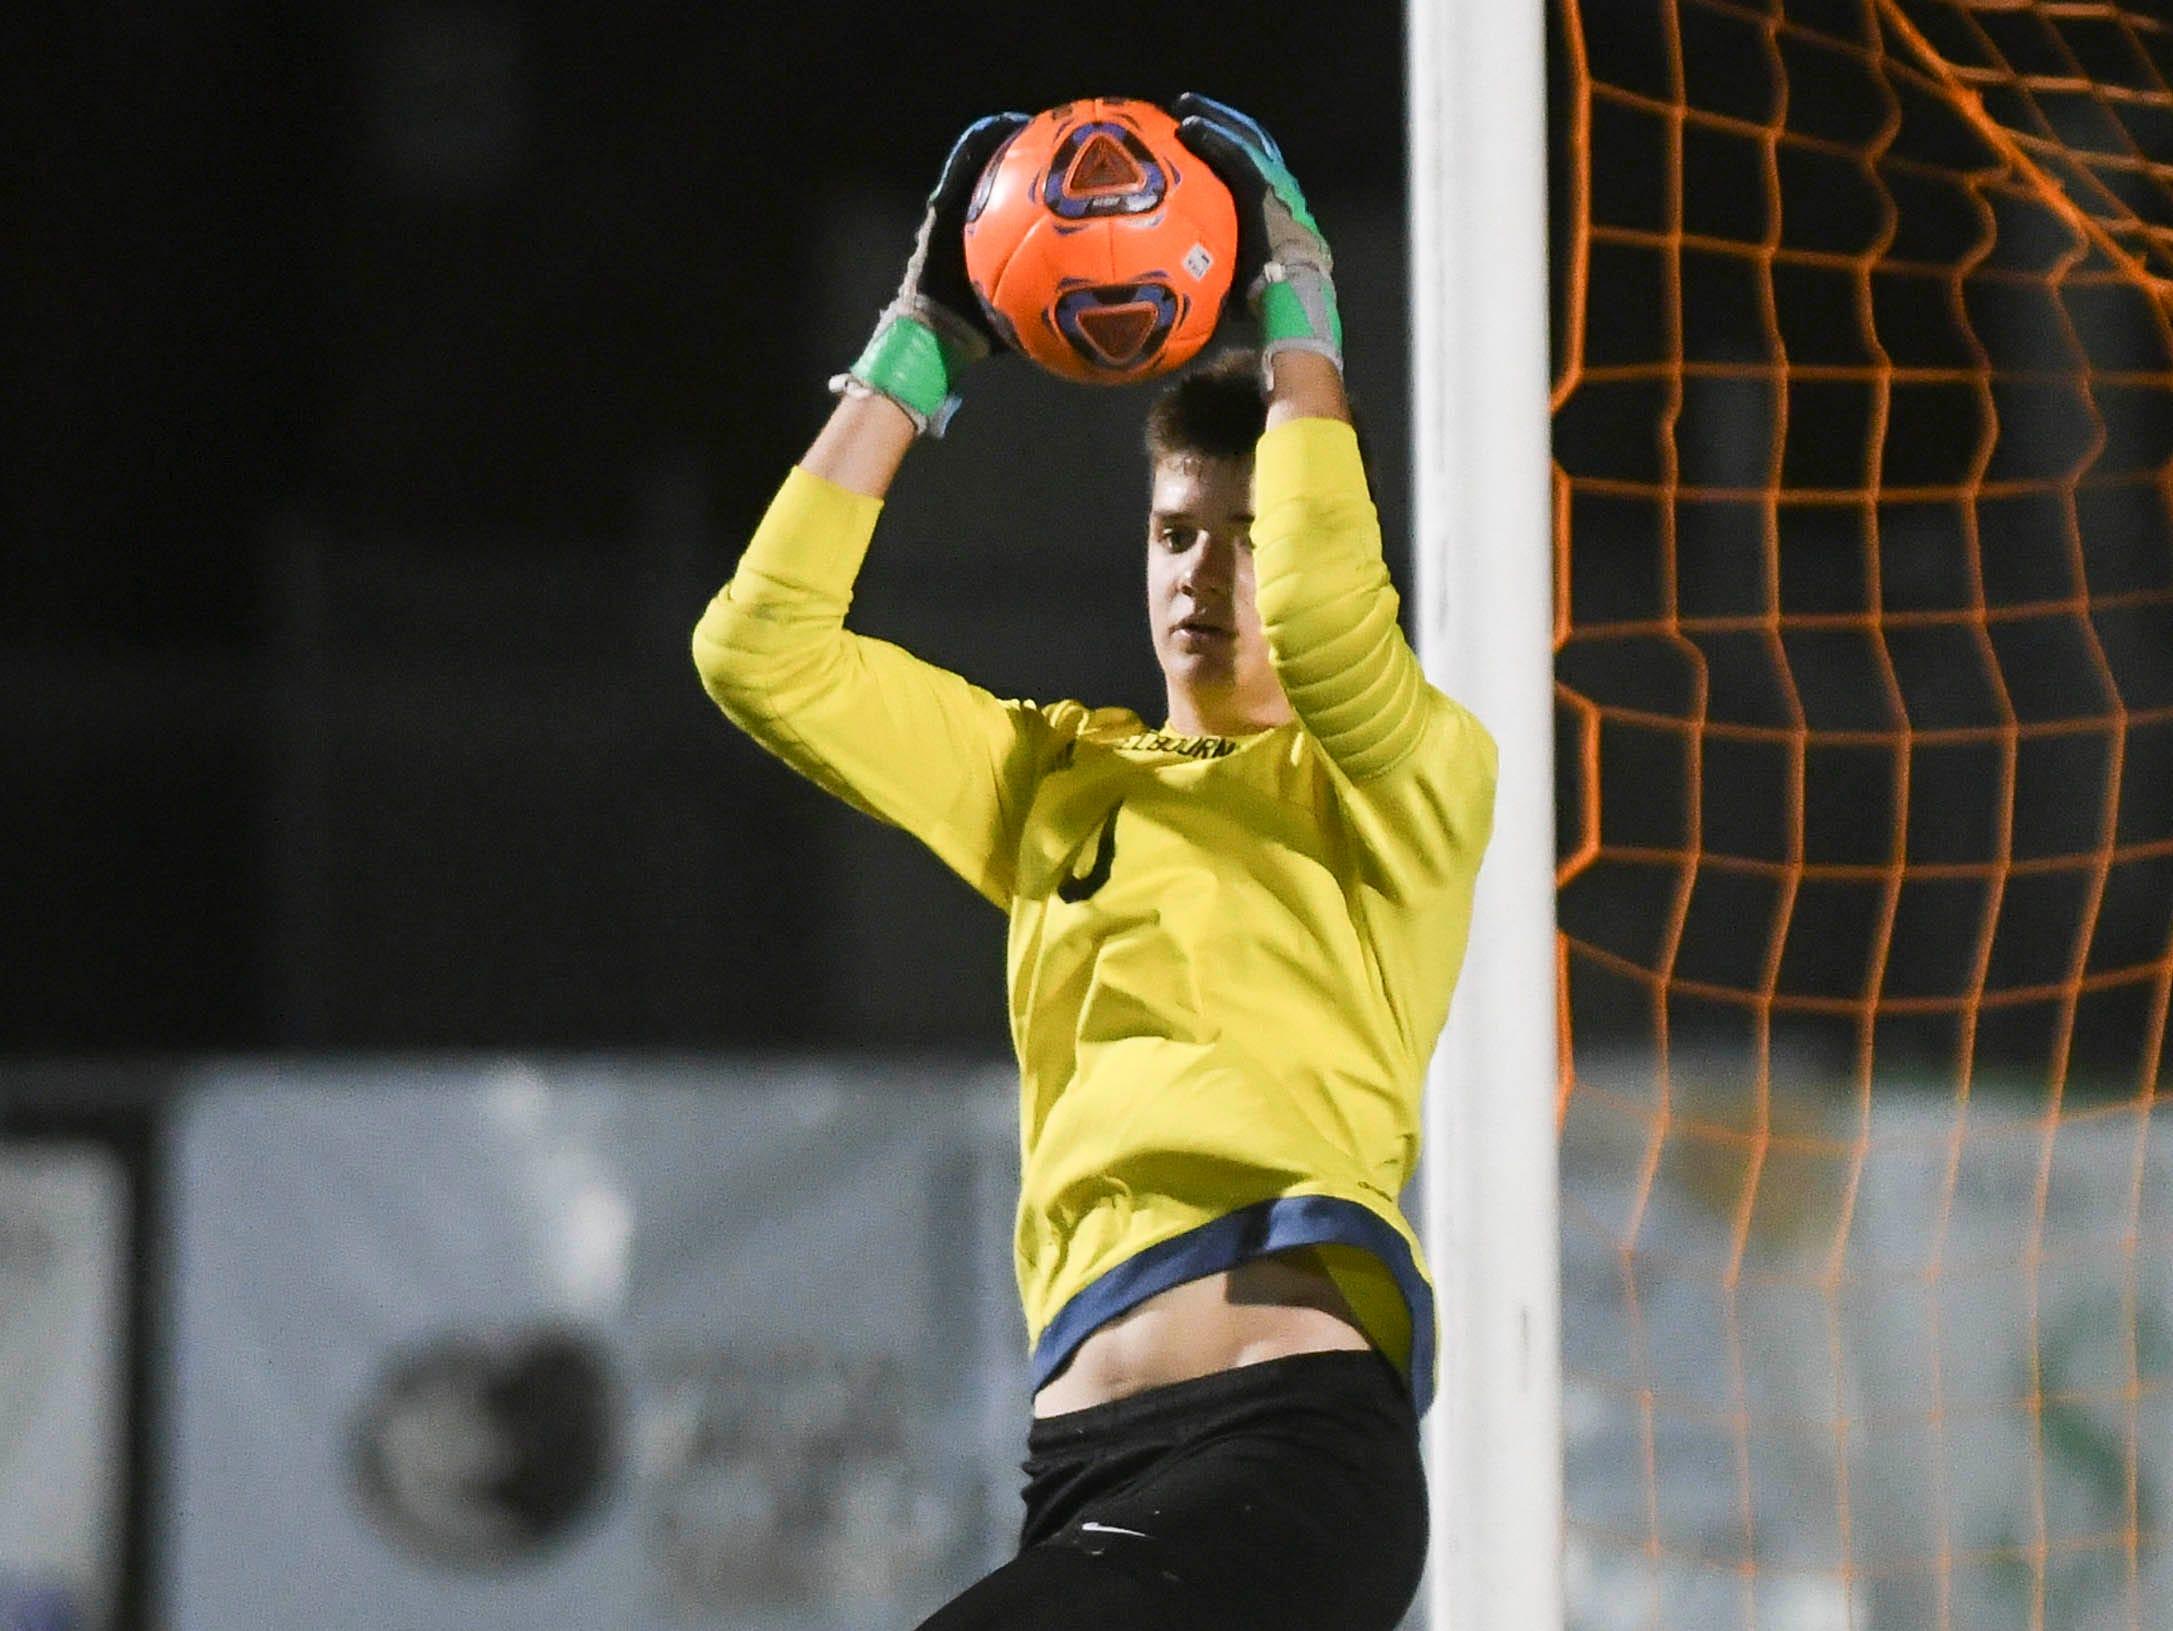 Melbourne goalkeeper Zach Browne stops a Sebastian River shot on goal during Friday's game in Melbourne.